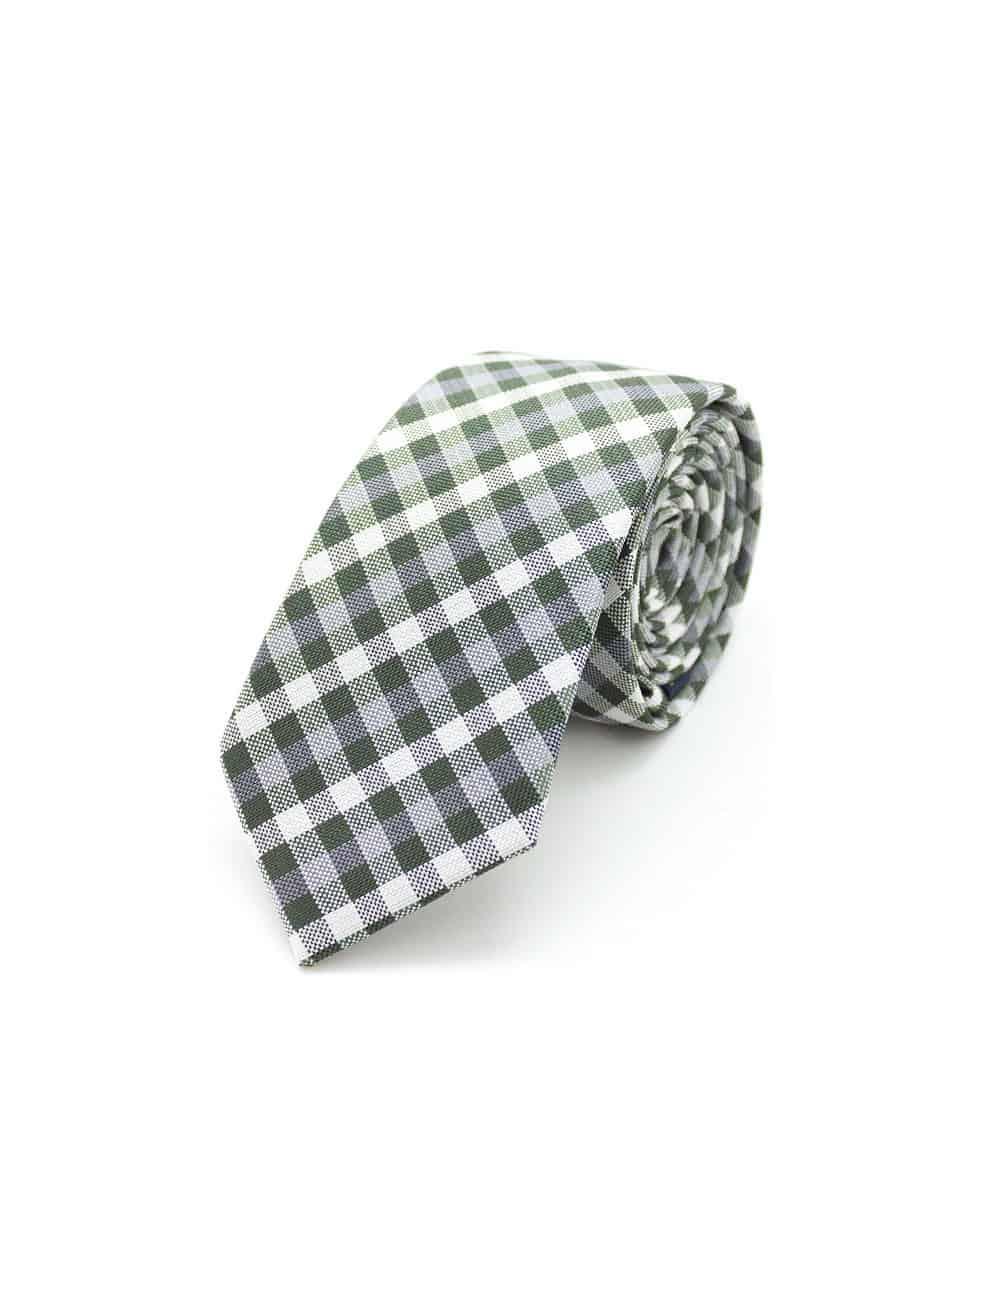 Green Checks Spill Resist Woven Necktie NT43.9